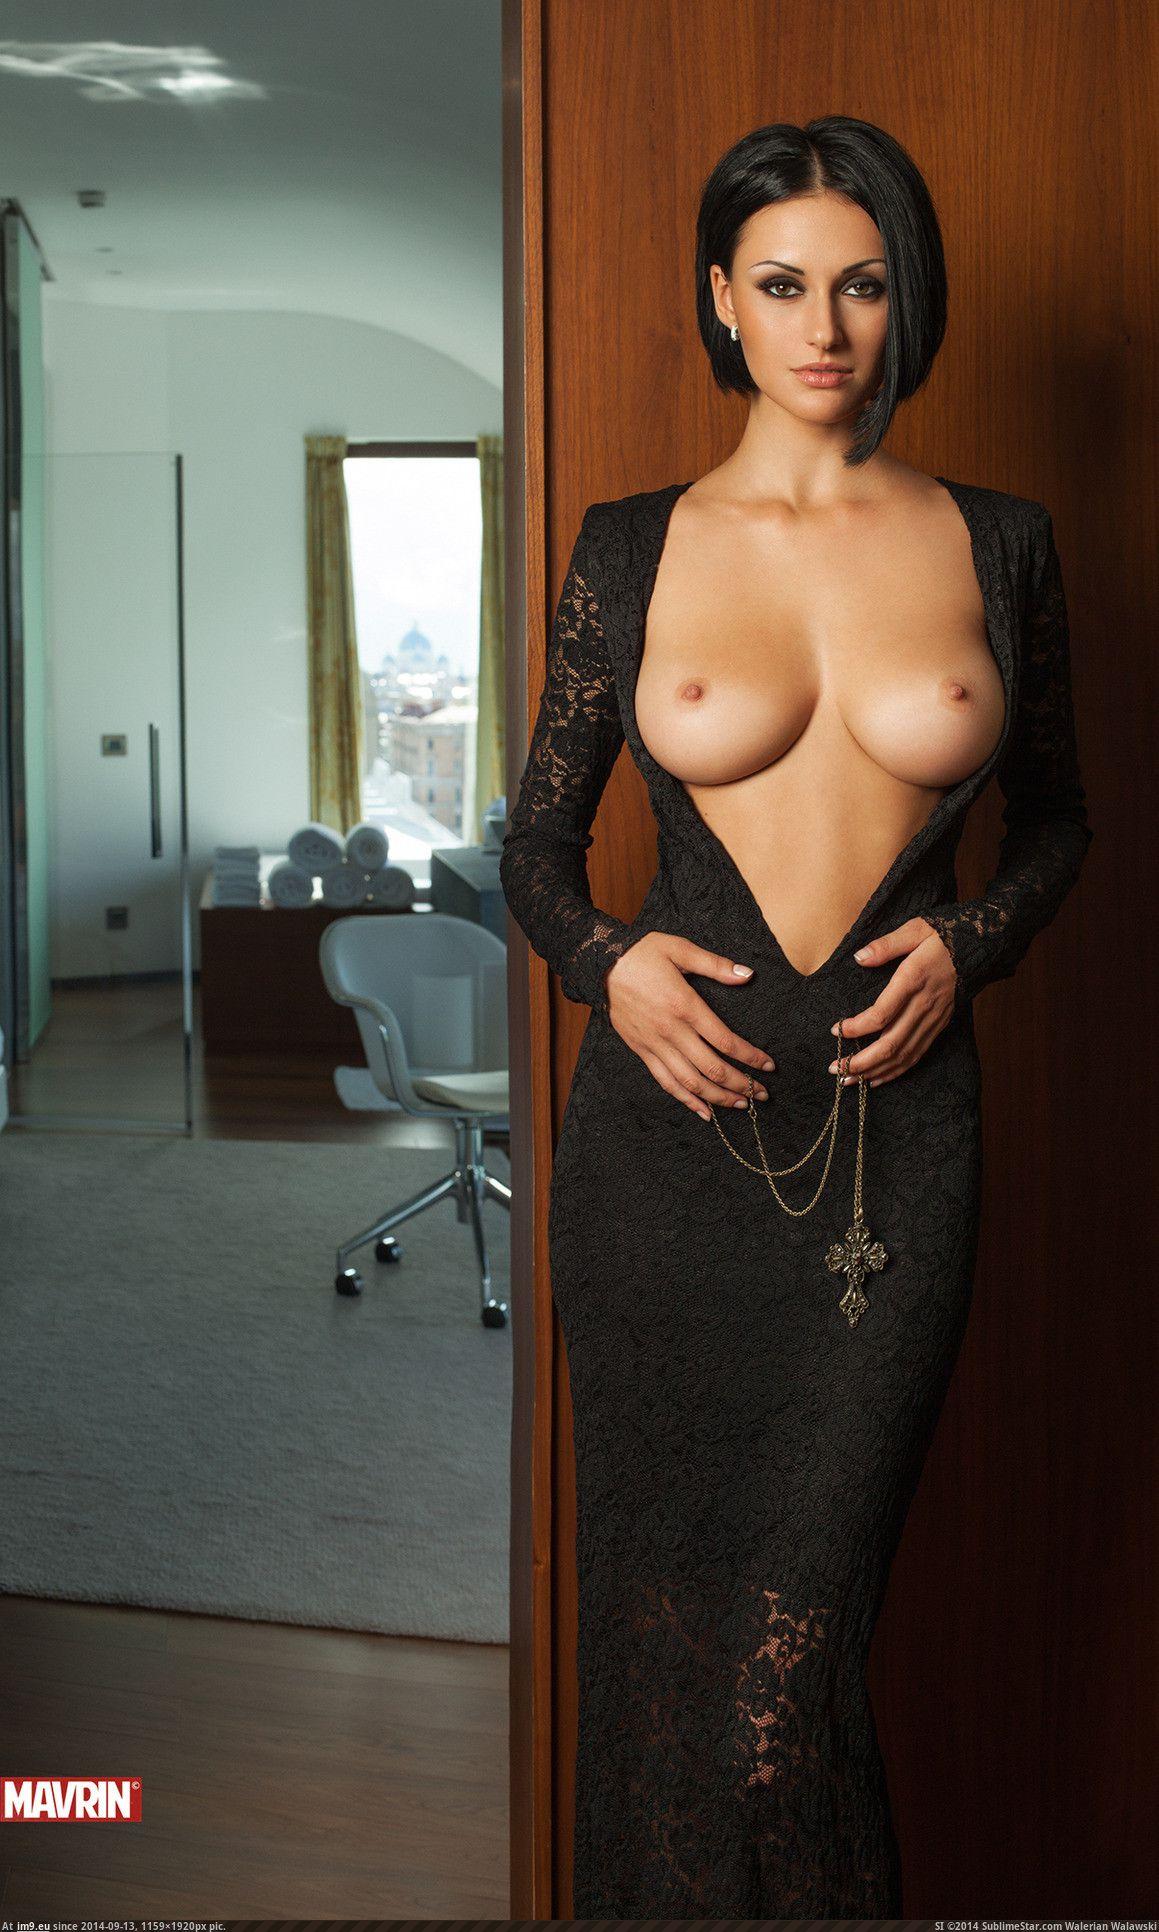 Эро фото девушки в платье: http://bg274.ru/page/ero-foto-devushki-v-plate